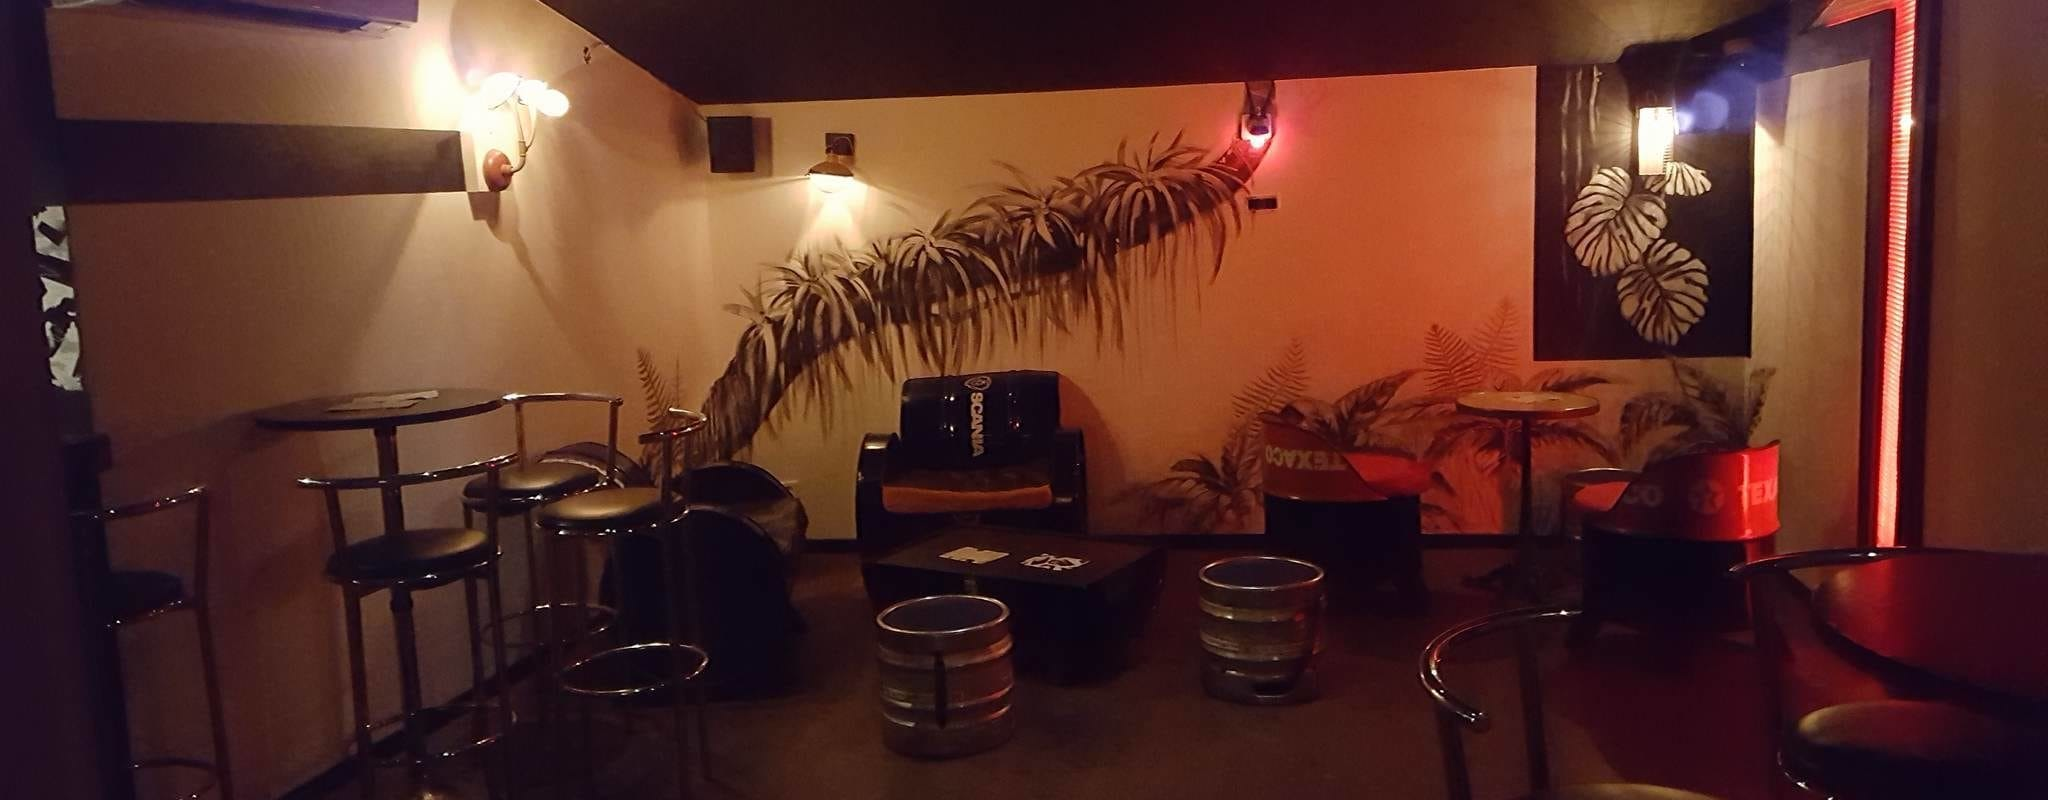 L'Elastic Bar : renouveau underground à la Krutenau